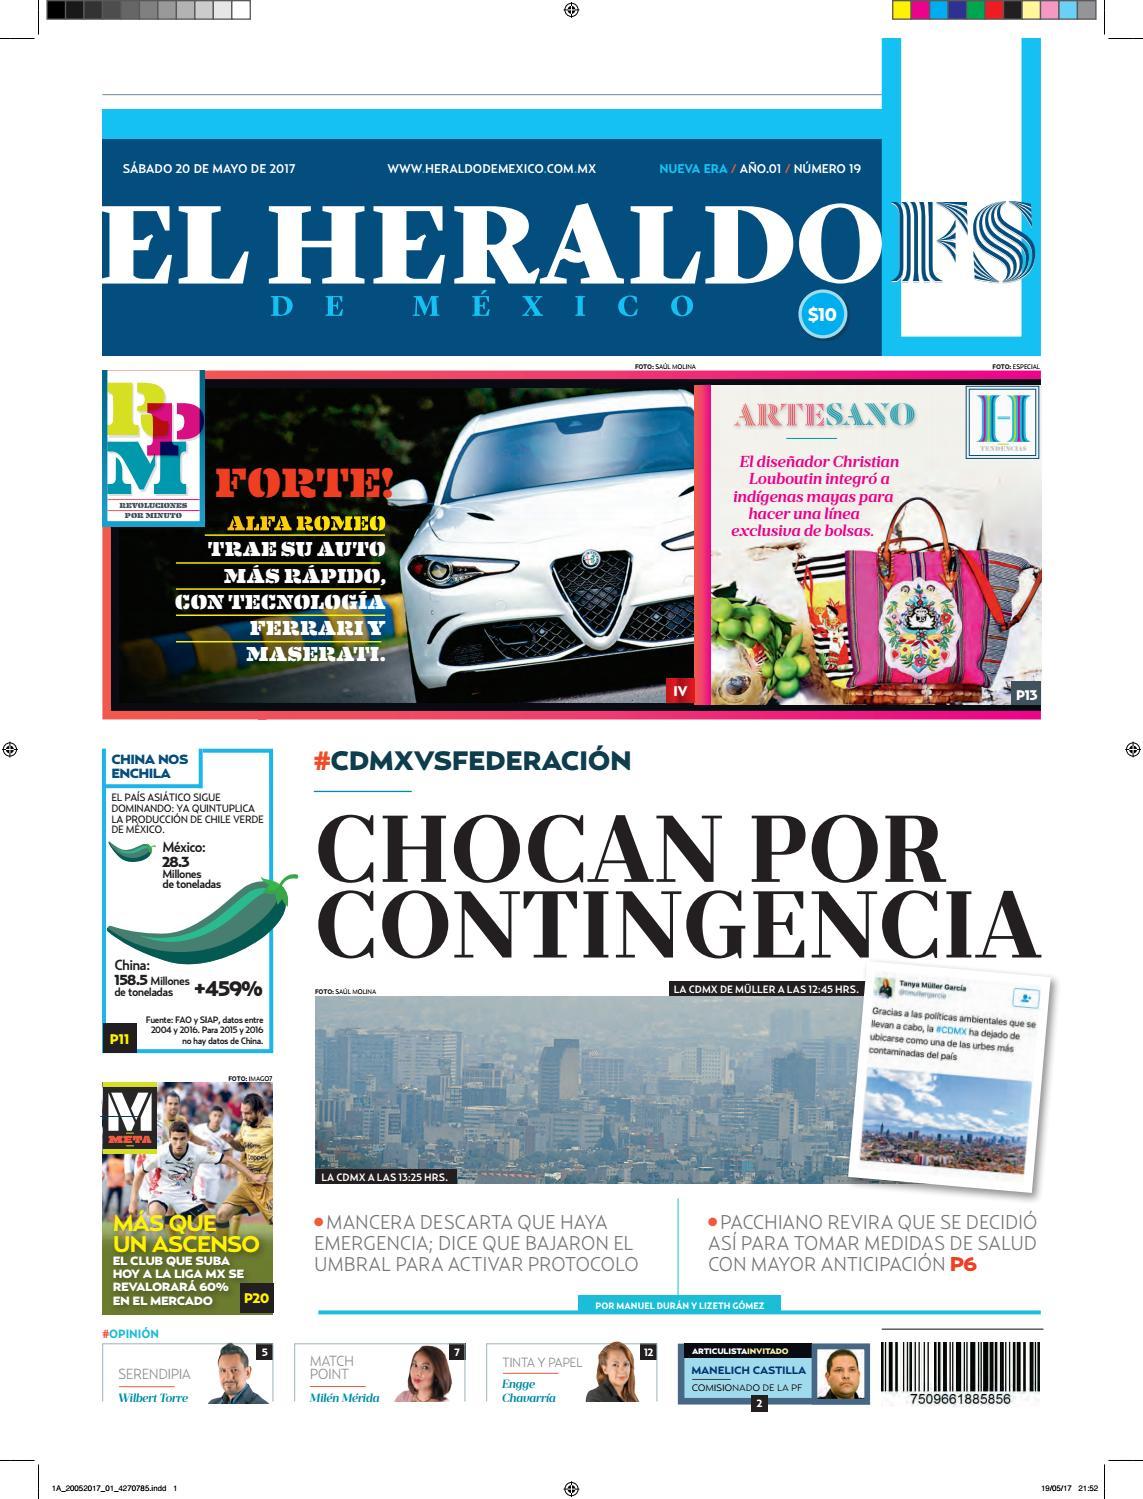 El Heraldo de México 20 de Mayo 2017 by El Heraldo de México - issuu e386fc703208e